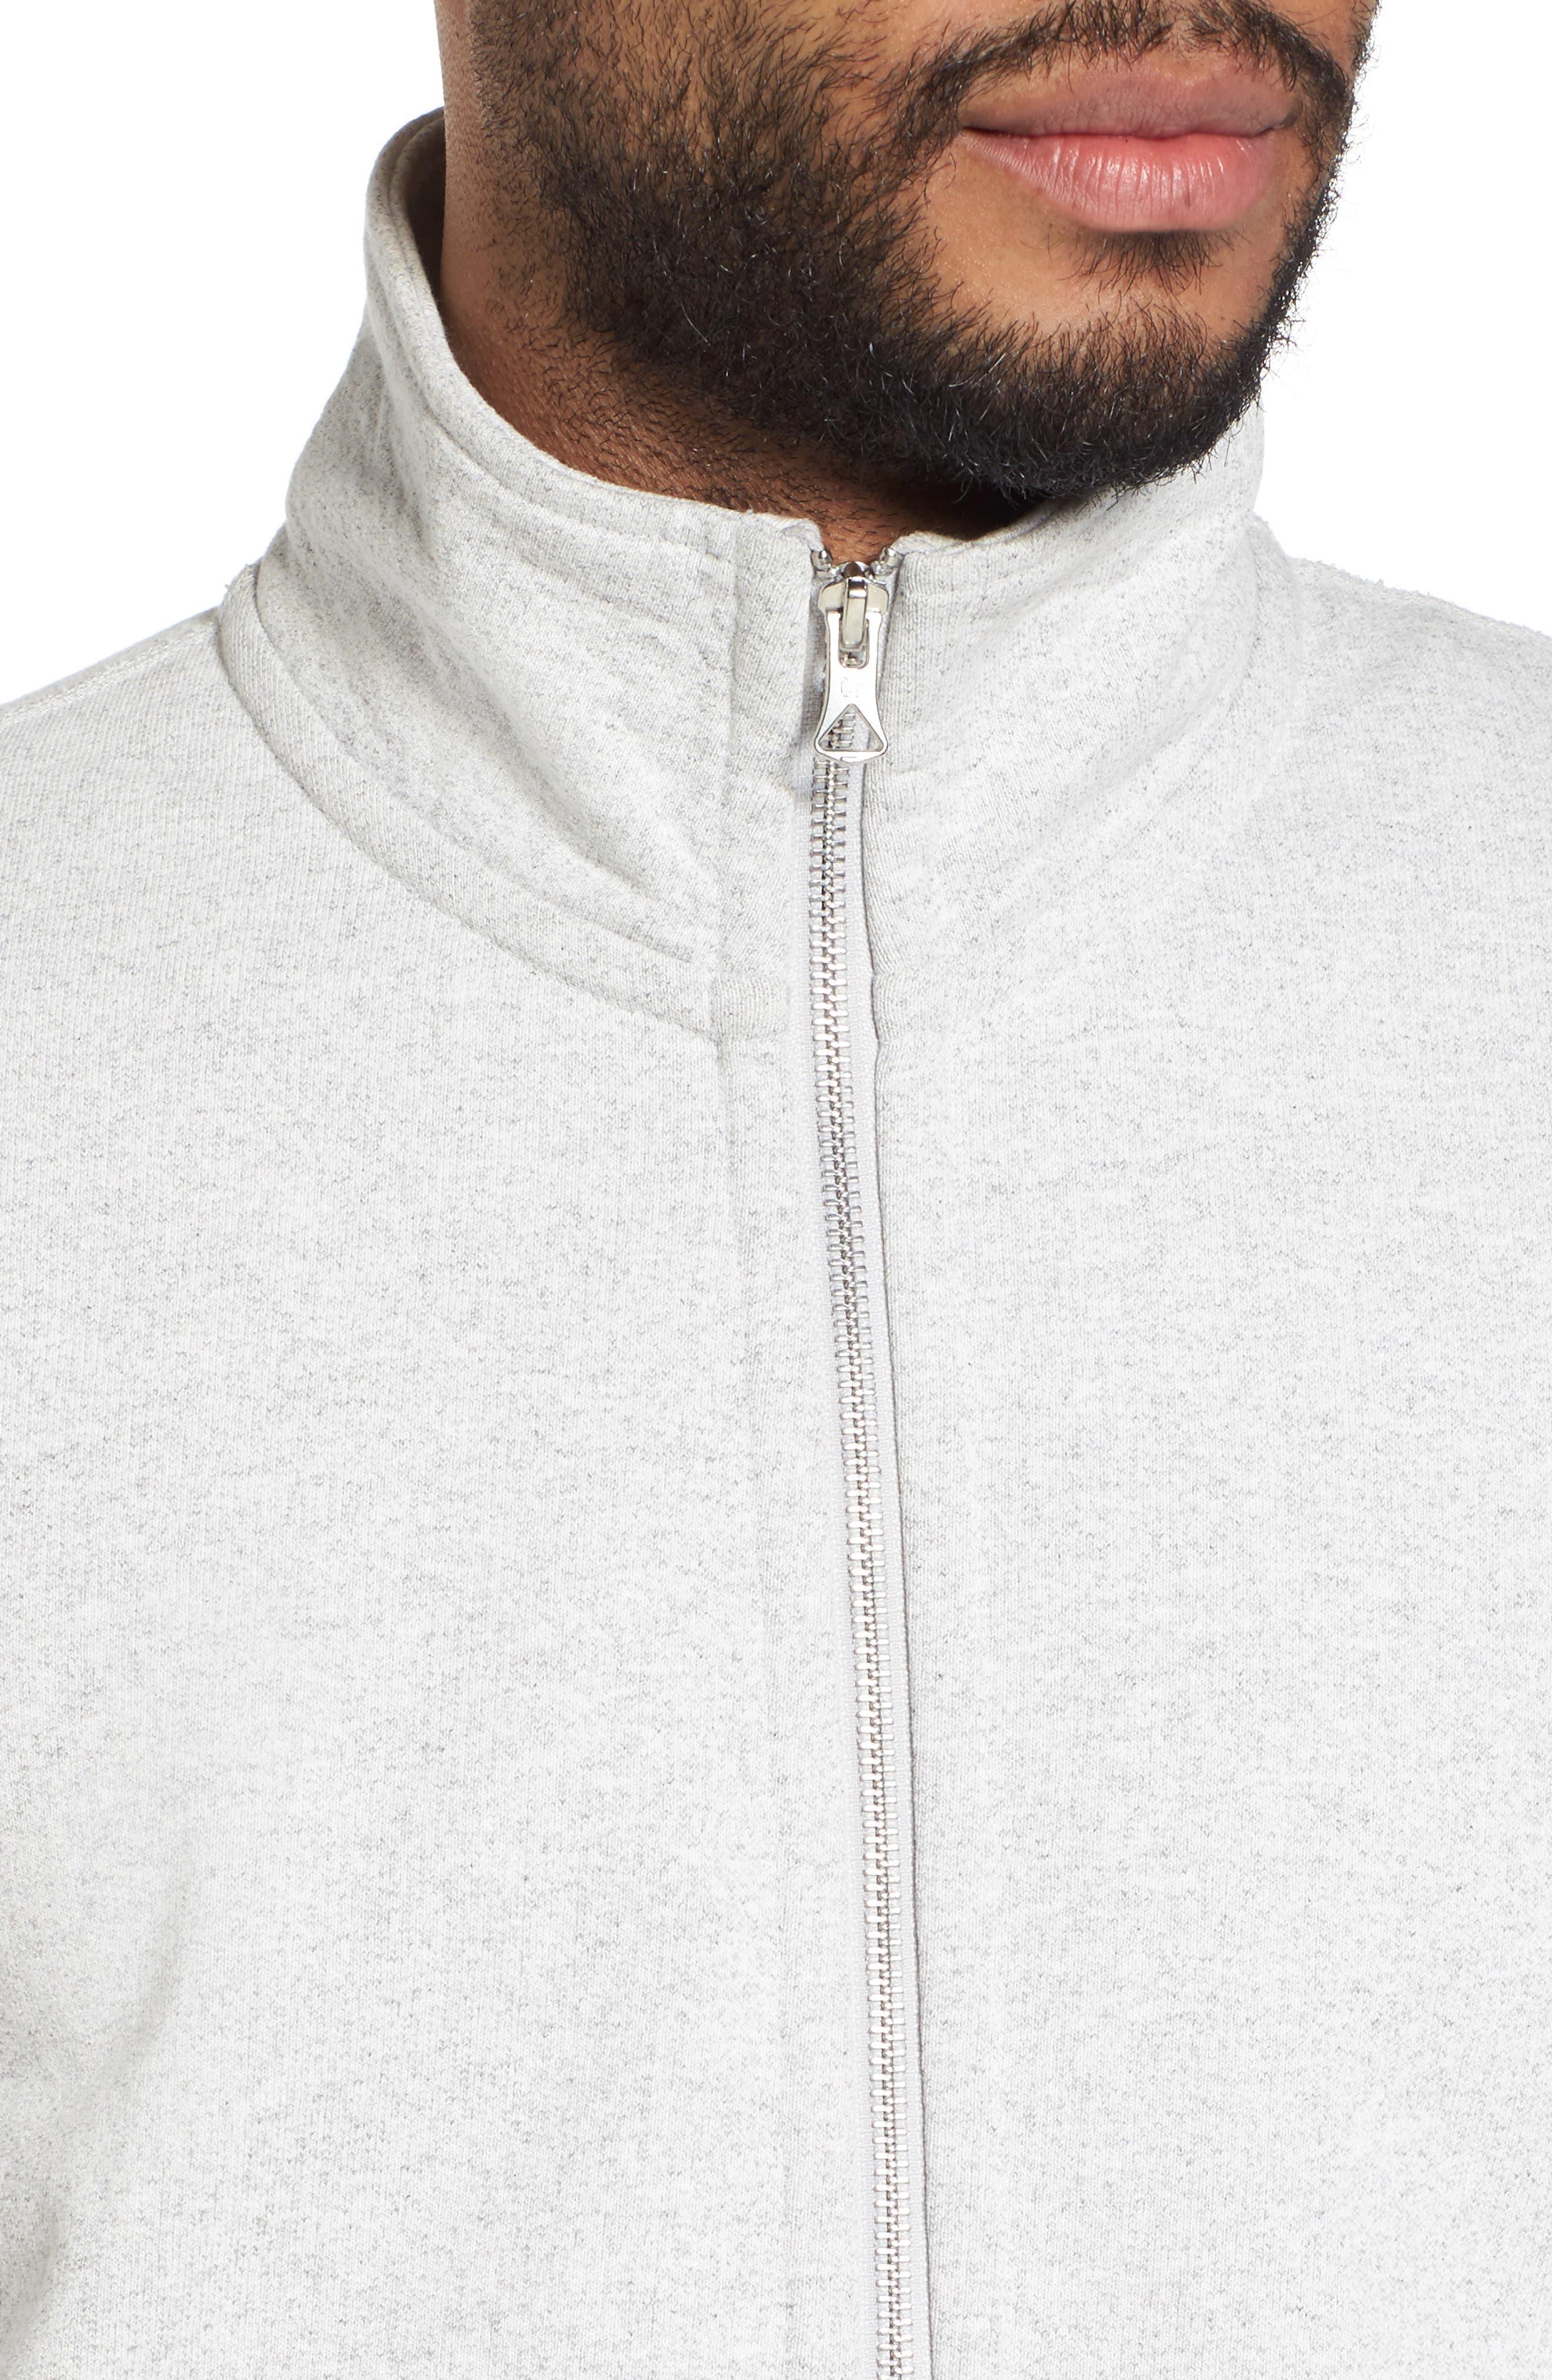 Regular Fit Track Jacket,                             Alternate thumbnail 4, color,                             051